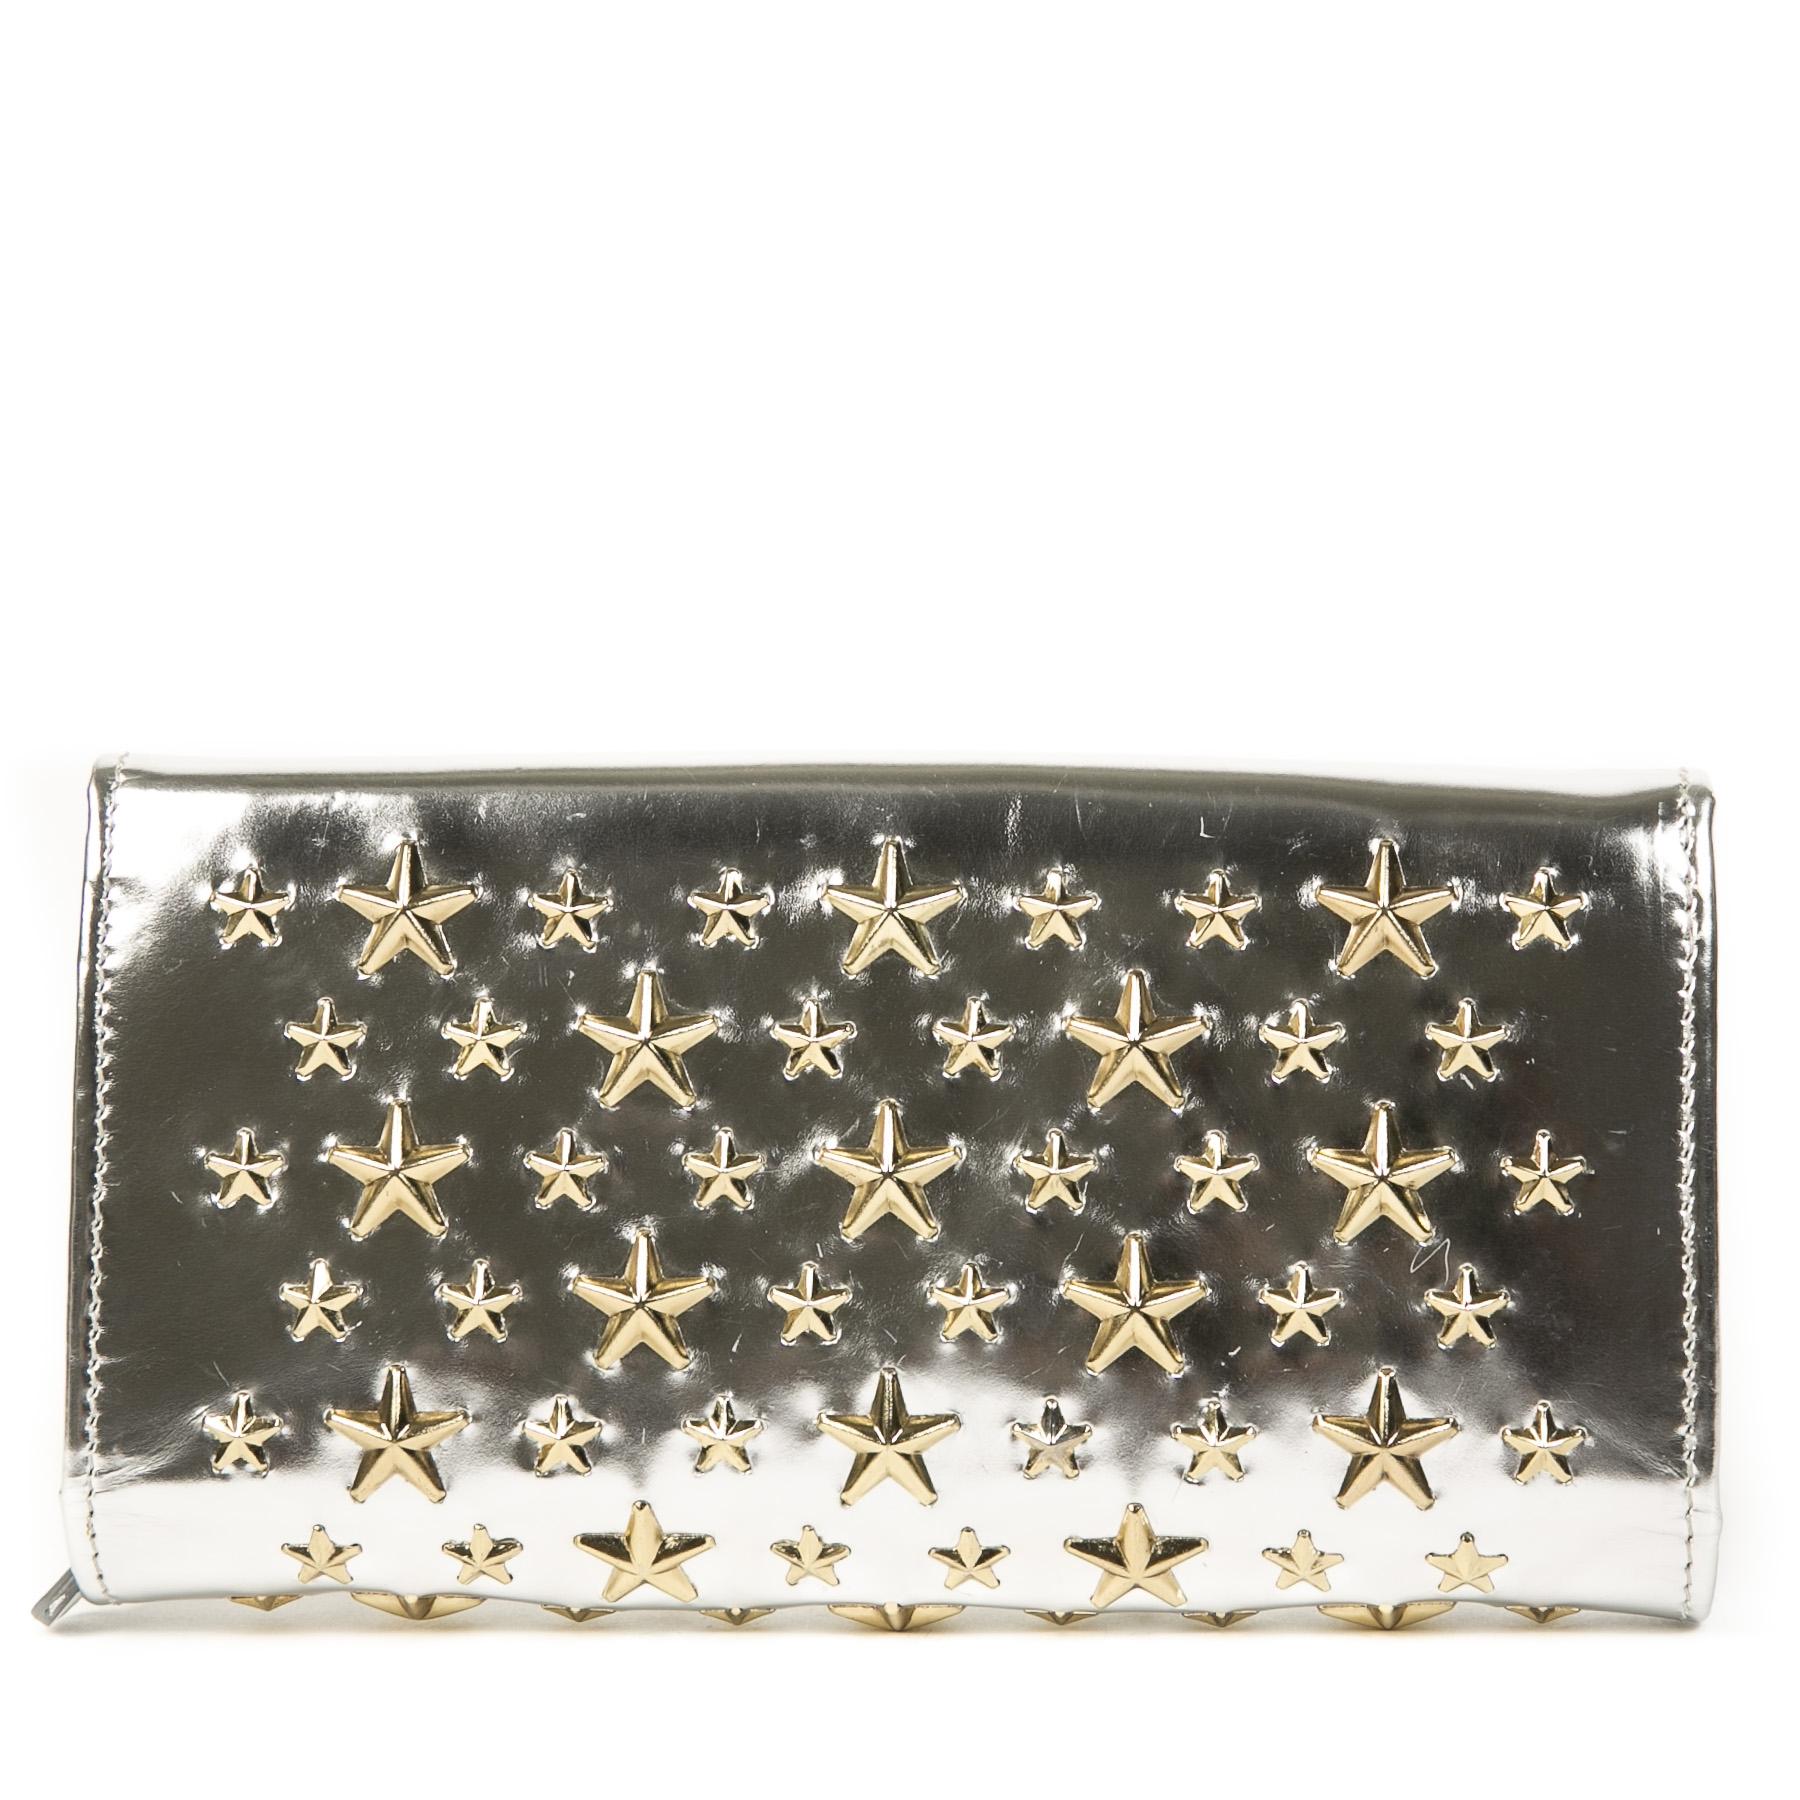 Authentieke Tweedehands Jimmy Choo Silver Stars Wallet On Chain juiste prijs veilig online shoppen luxe merken webshop winkelen Antwerpen België mode fashion